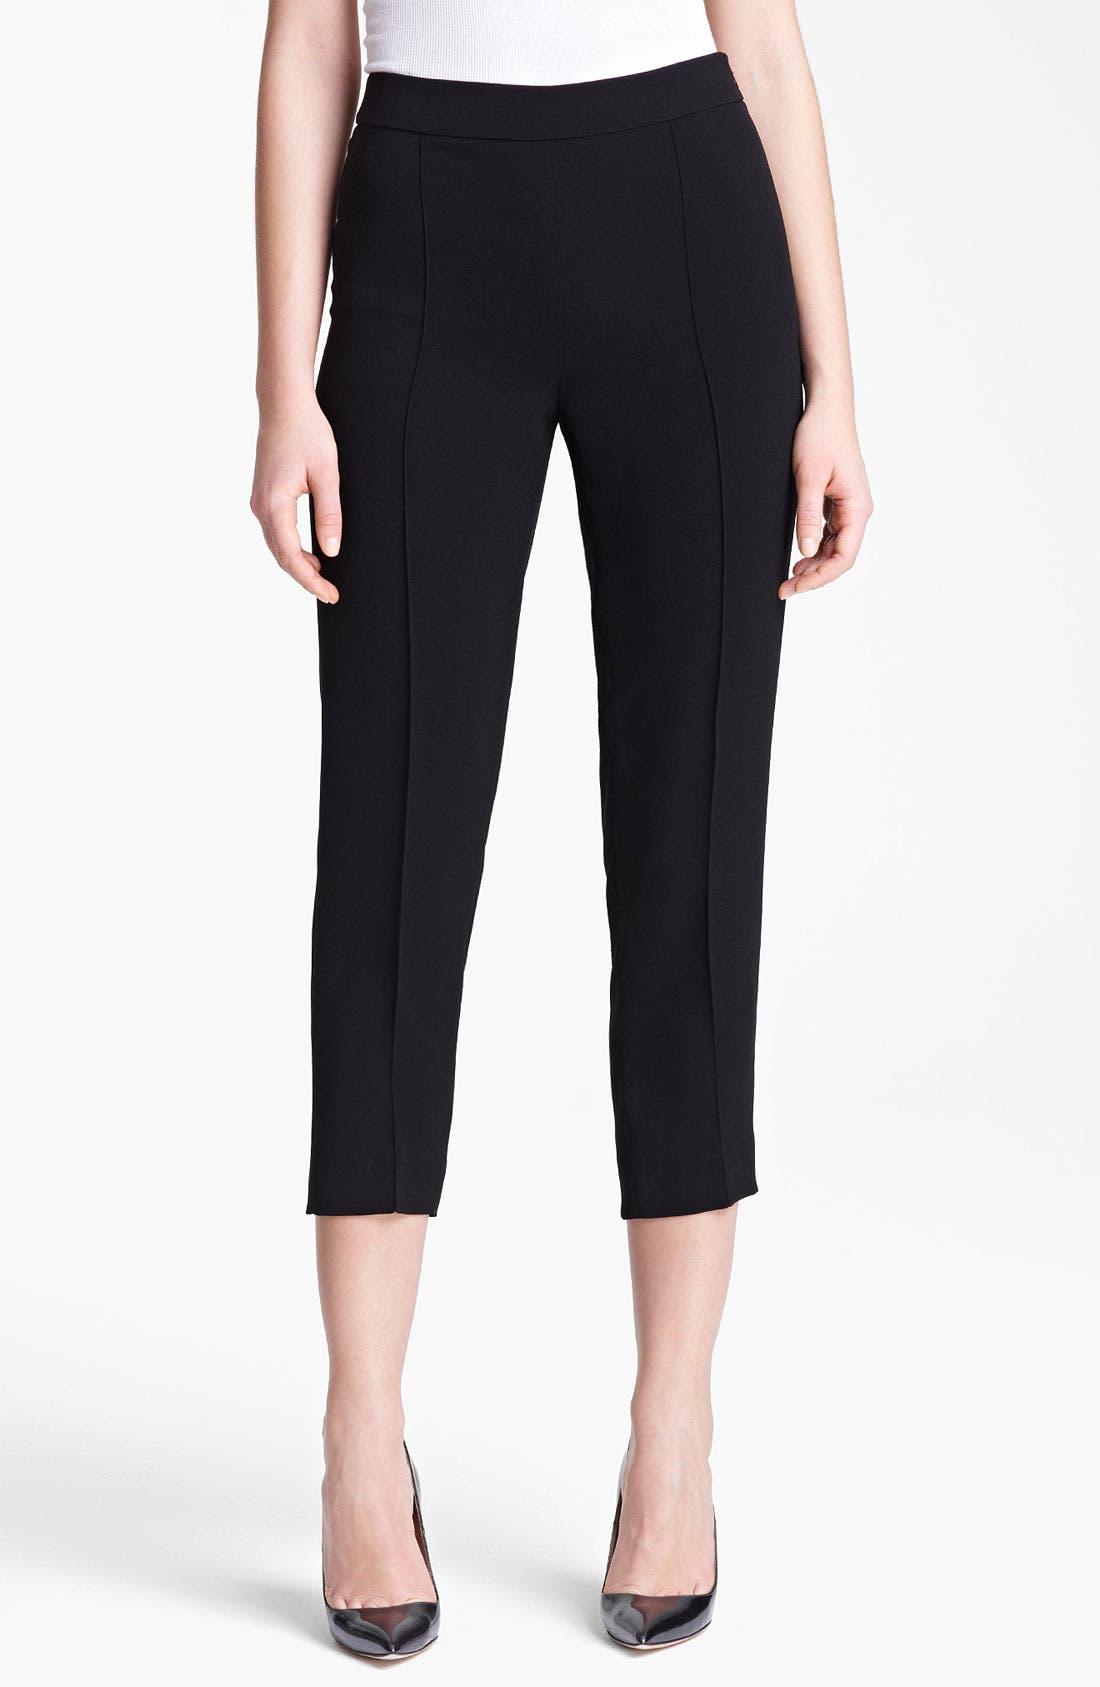 Alternate Image 1 Selected - Max Mara Side Zip Crop Pants